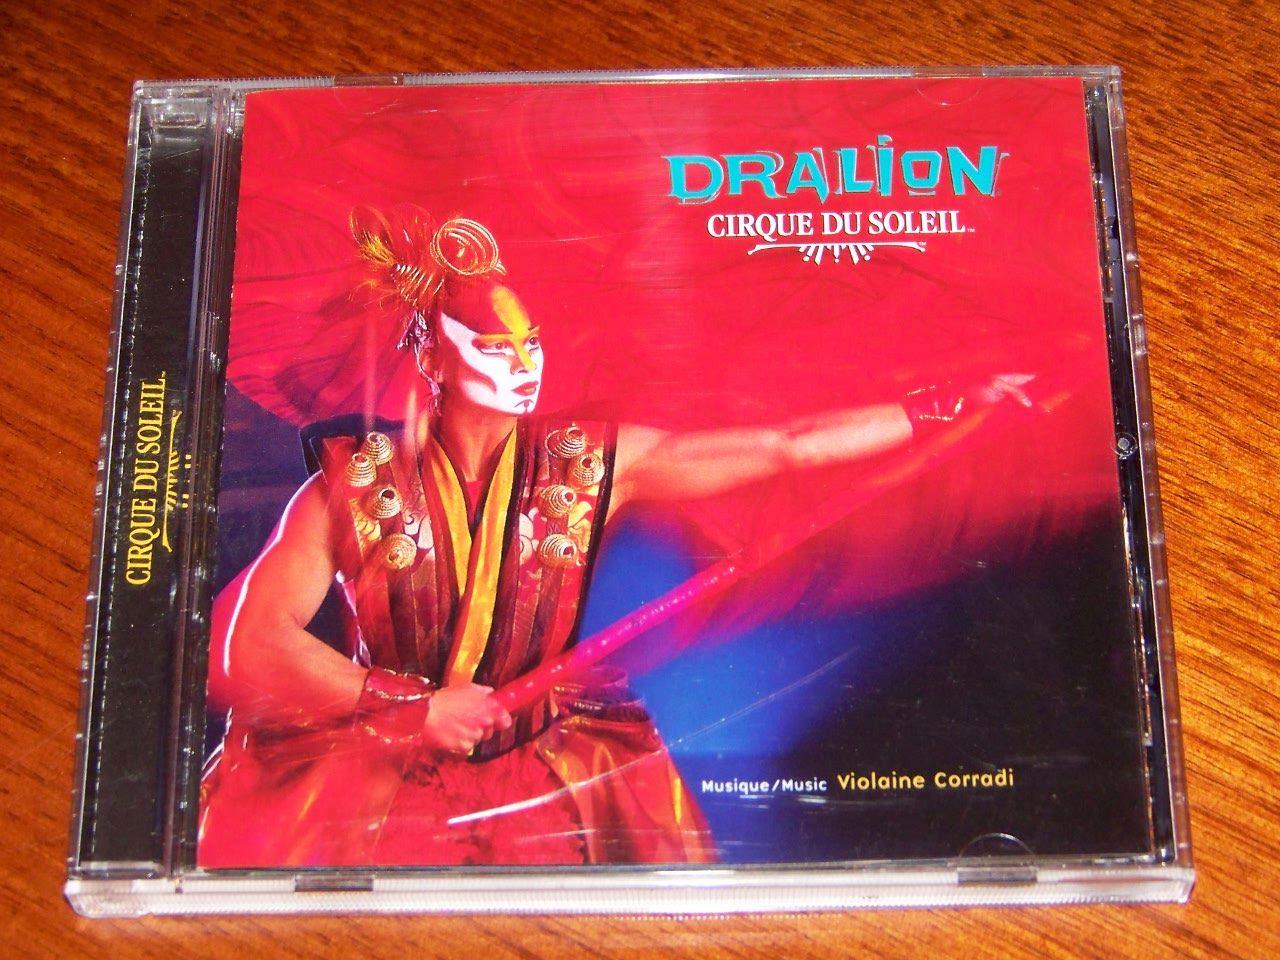 Dralion-Cirque-du-Soleil-2005-CD